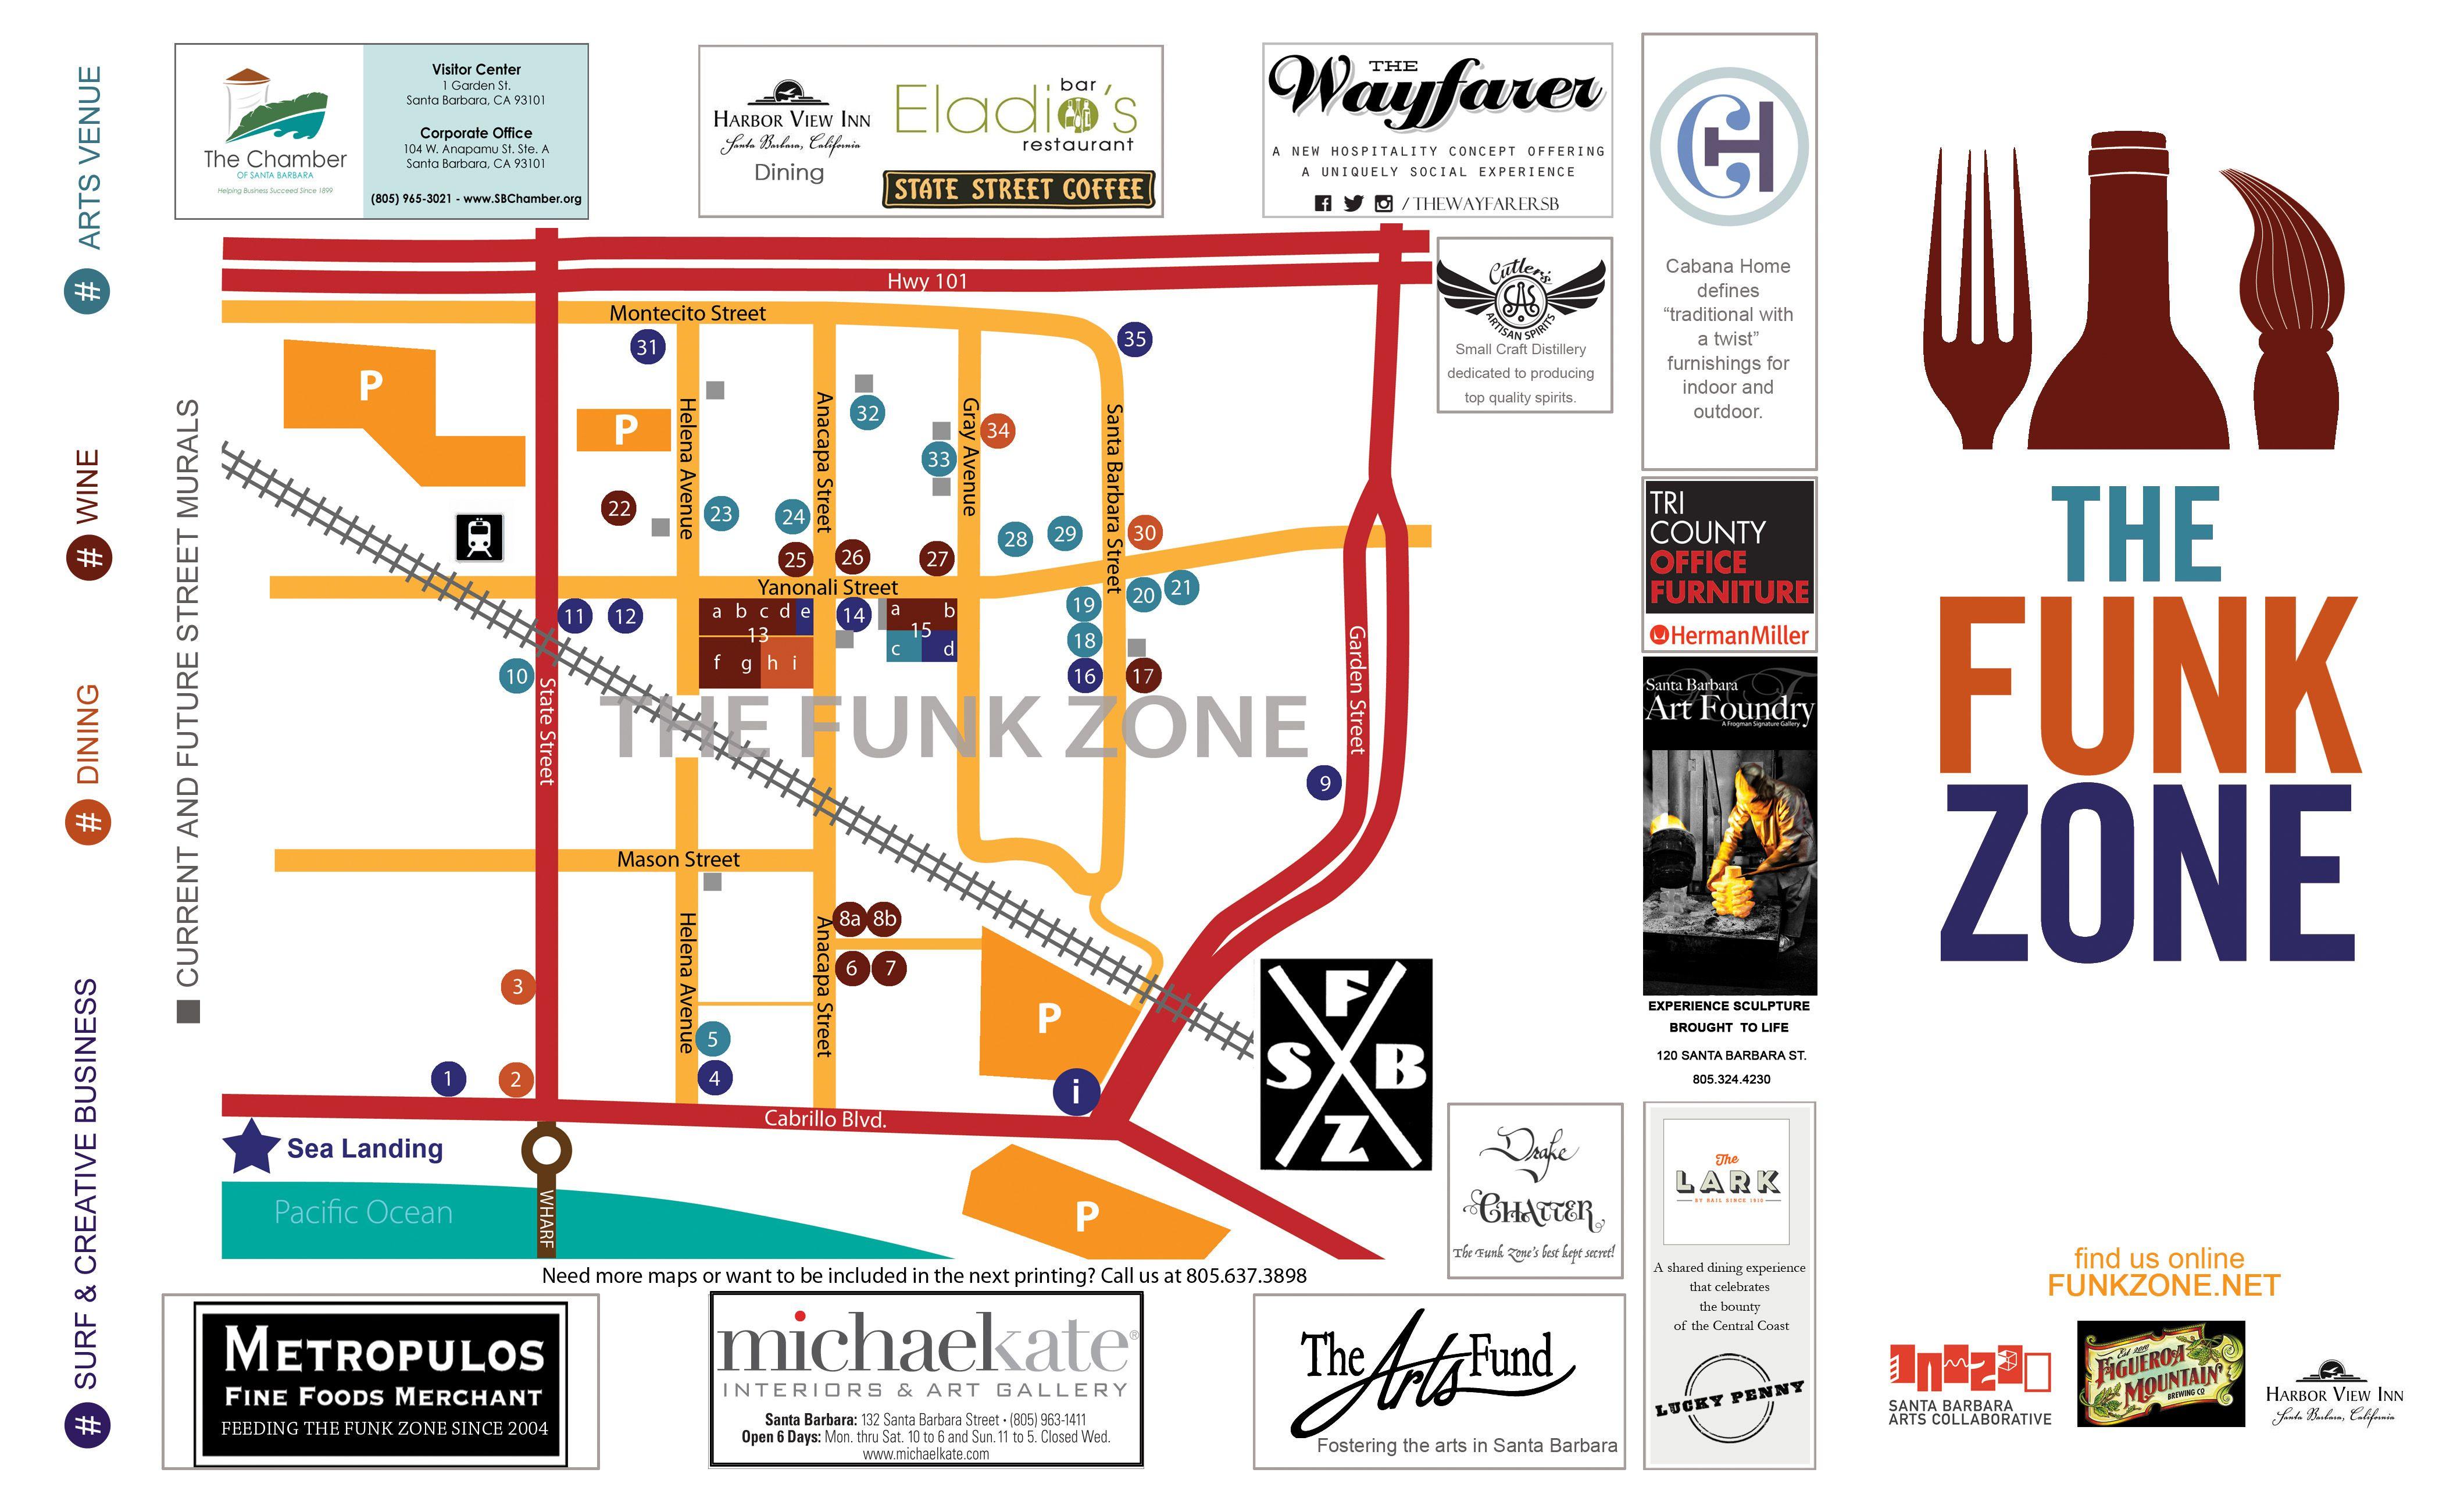 Funk Zone Map 2015- Santa Barbara   Travel Plans in 2019 ... Santa Barbara Hotel Map on pensacola hotel map, san francisco hotel map, kihei maui hotel map, san luis obispo hotel map, treasure coast hotel map, half moon bay hotel map, corvallis hotel map, dana point hotel map, eugene hotel map, oregon coast hotel map, delano hotel map, lake havasu hotel map, tulsa hotel map, chicago area hotel map, burlingame hotel map, providence hotel map, sunset strip hotel map, san jose hotel map, henderson hotel map, kalamazoo hotel map,